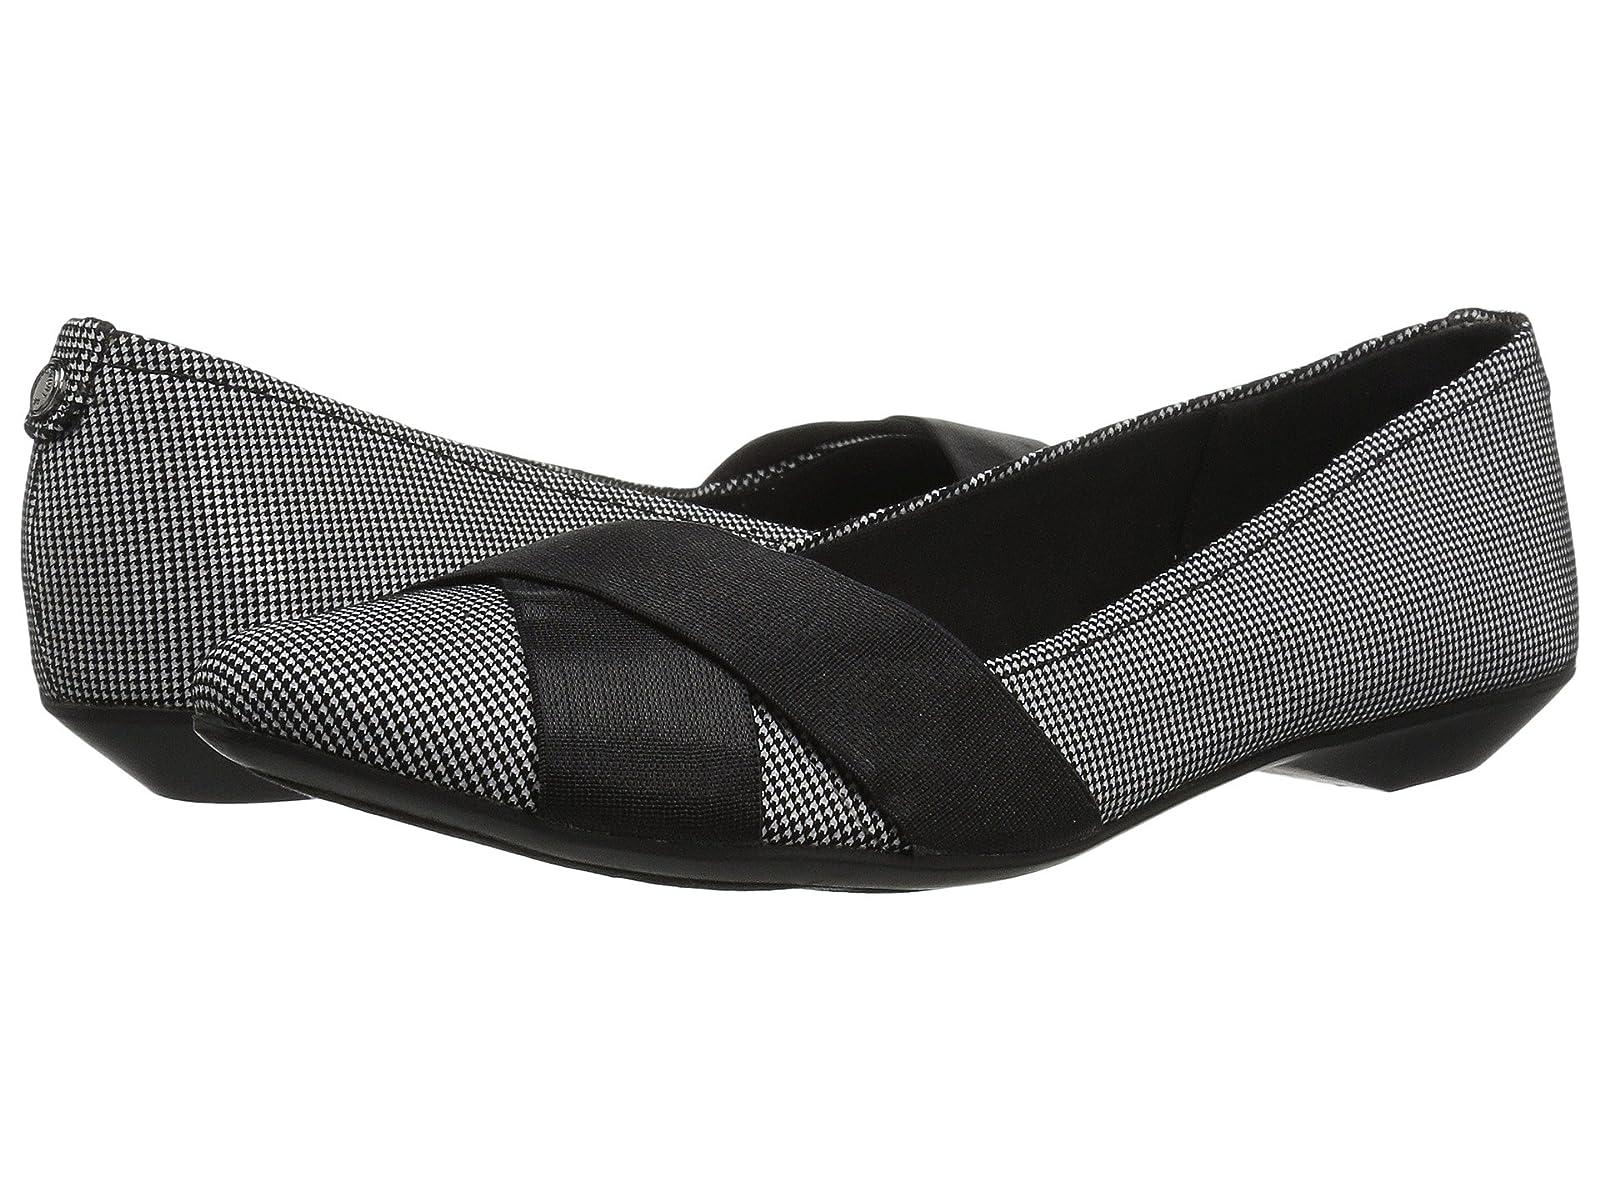 Anne Klein OaliseAtmospheric grades have affordable shoes